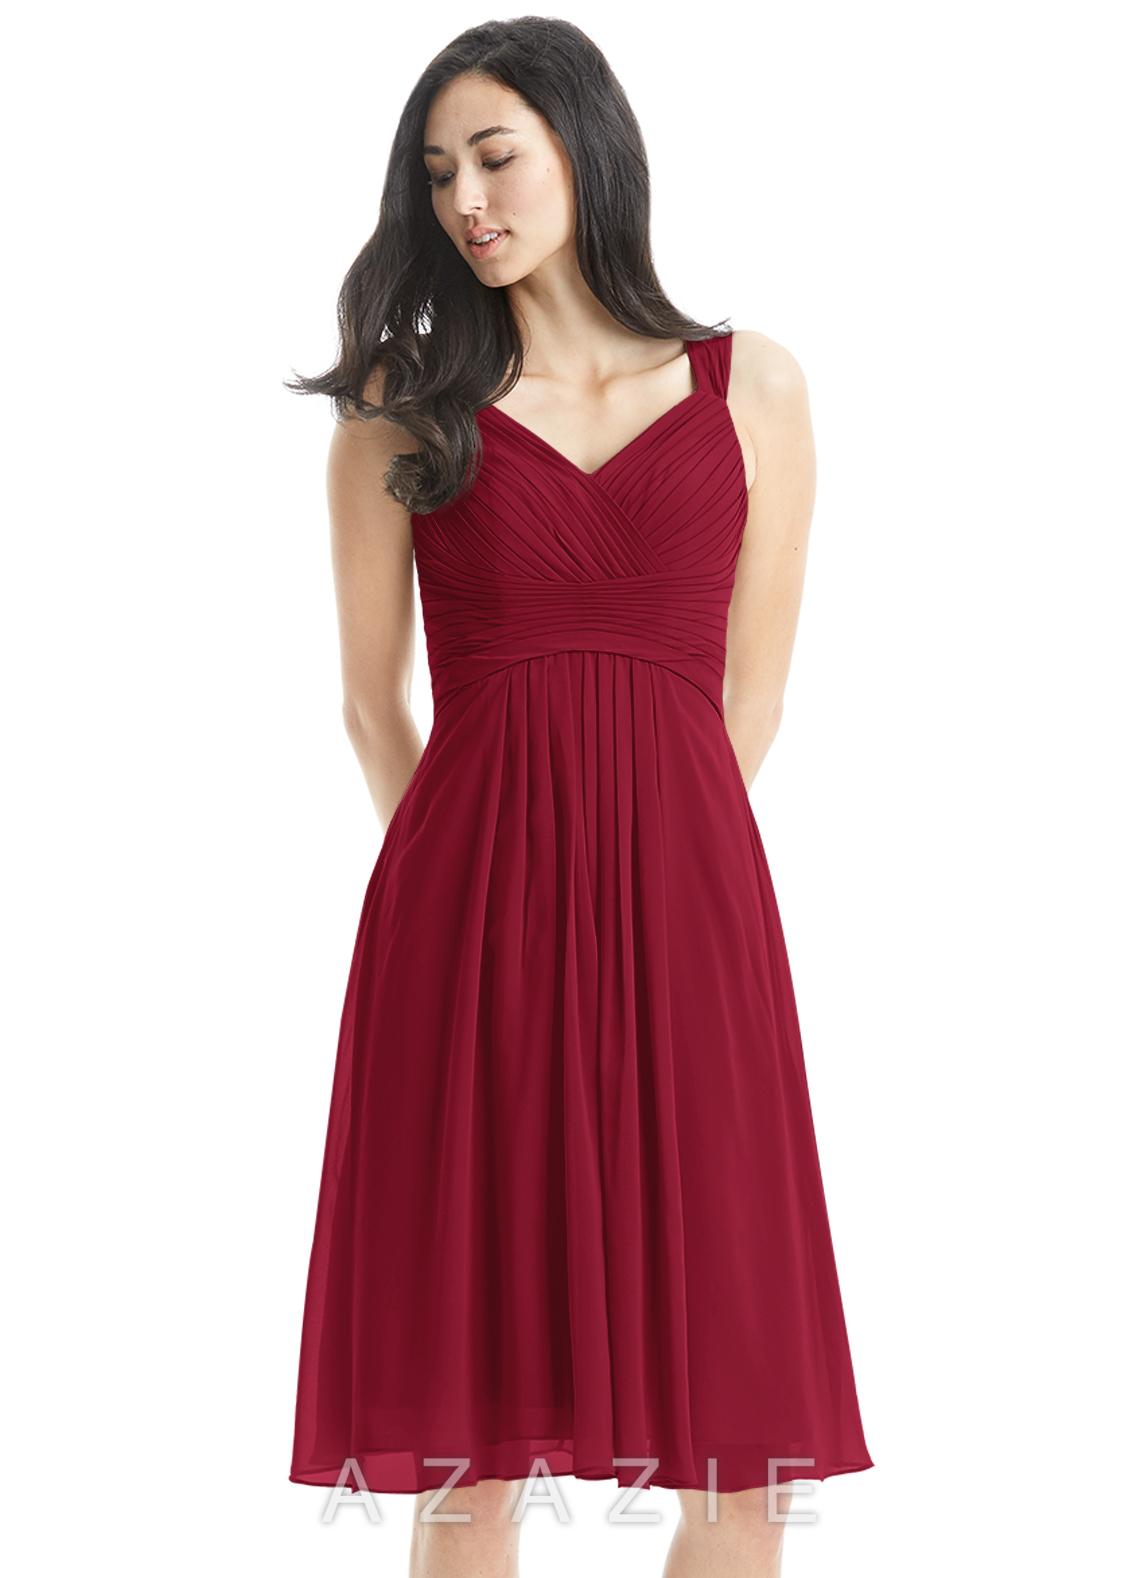 78c98938942 Azazie Bridesmaid Dresses For Sale - Gomes Weine AG